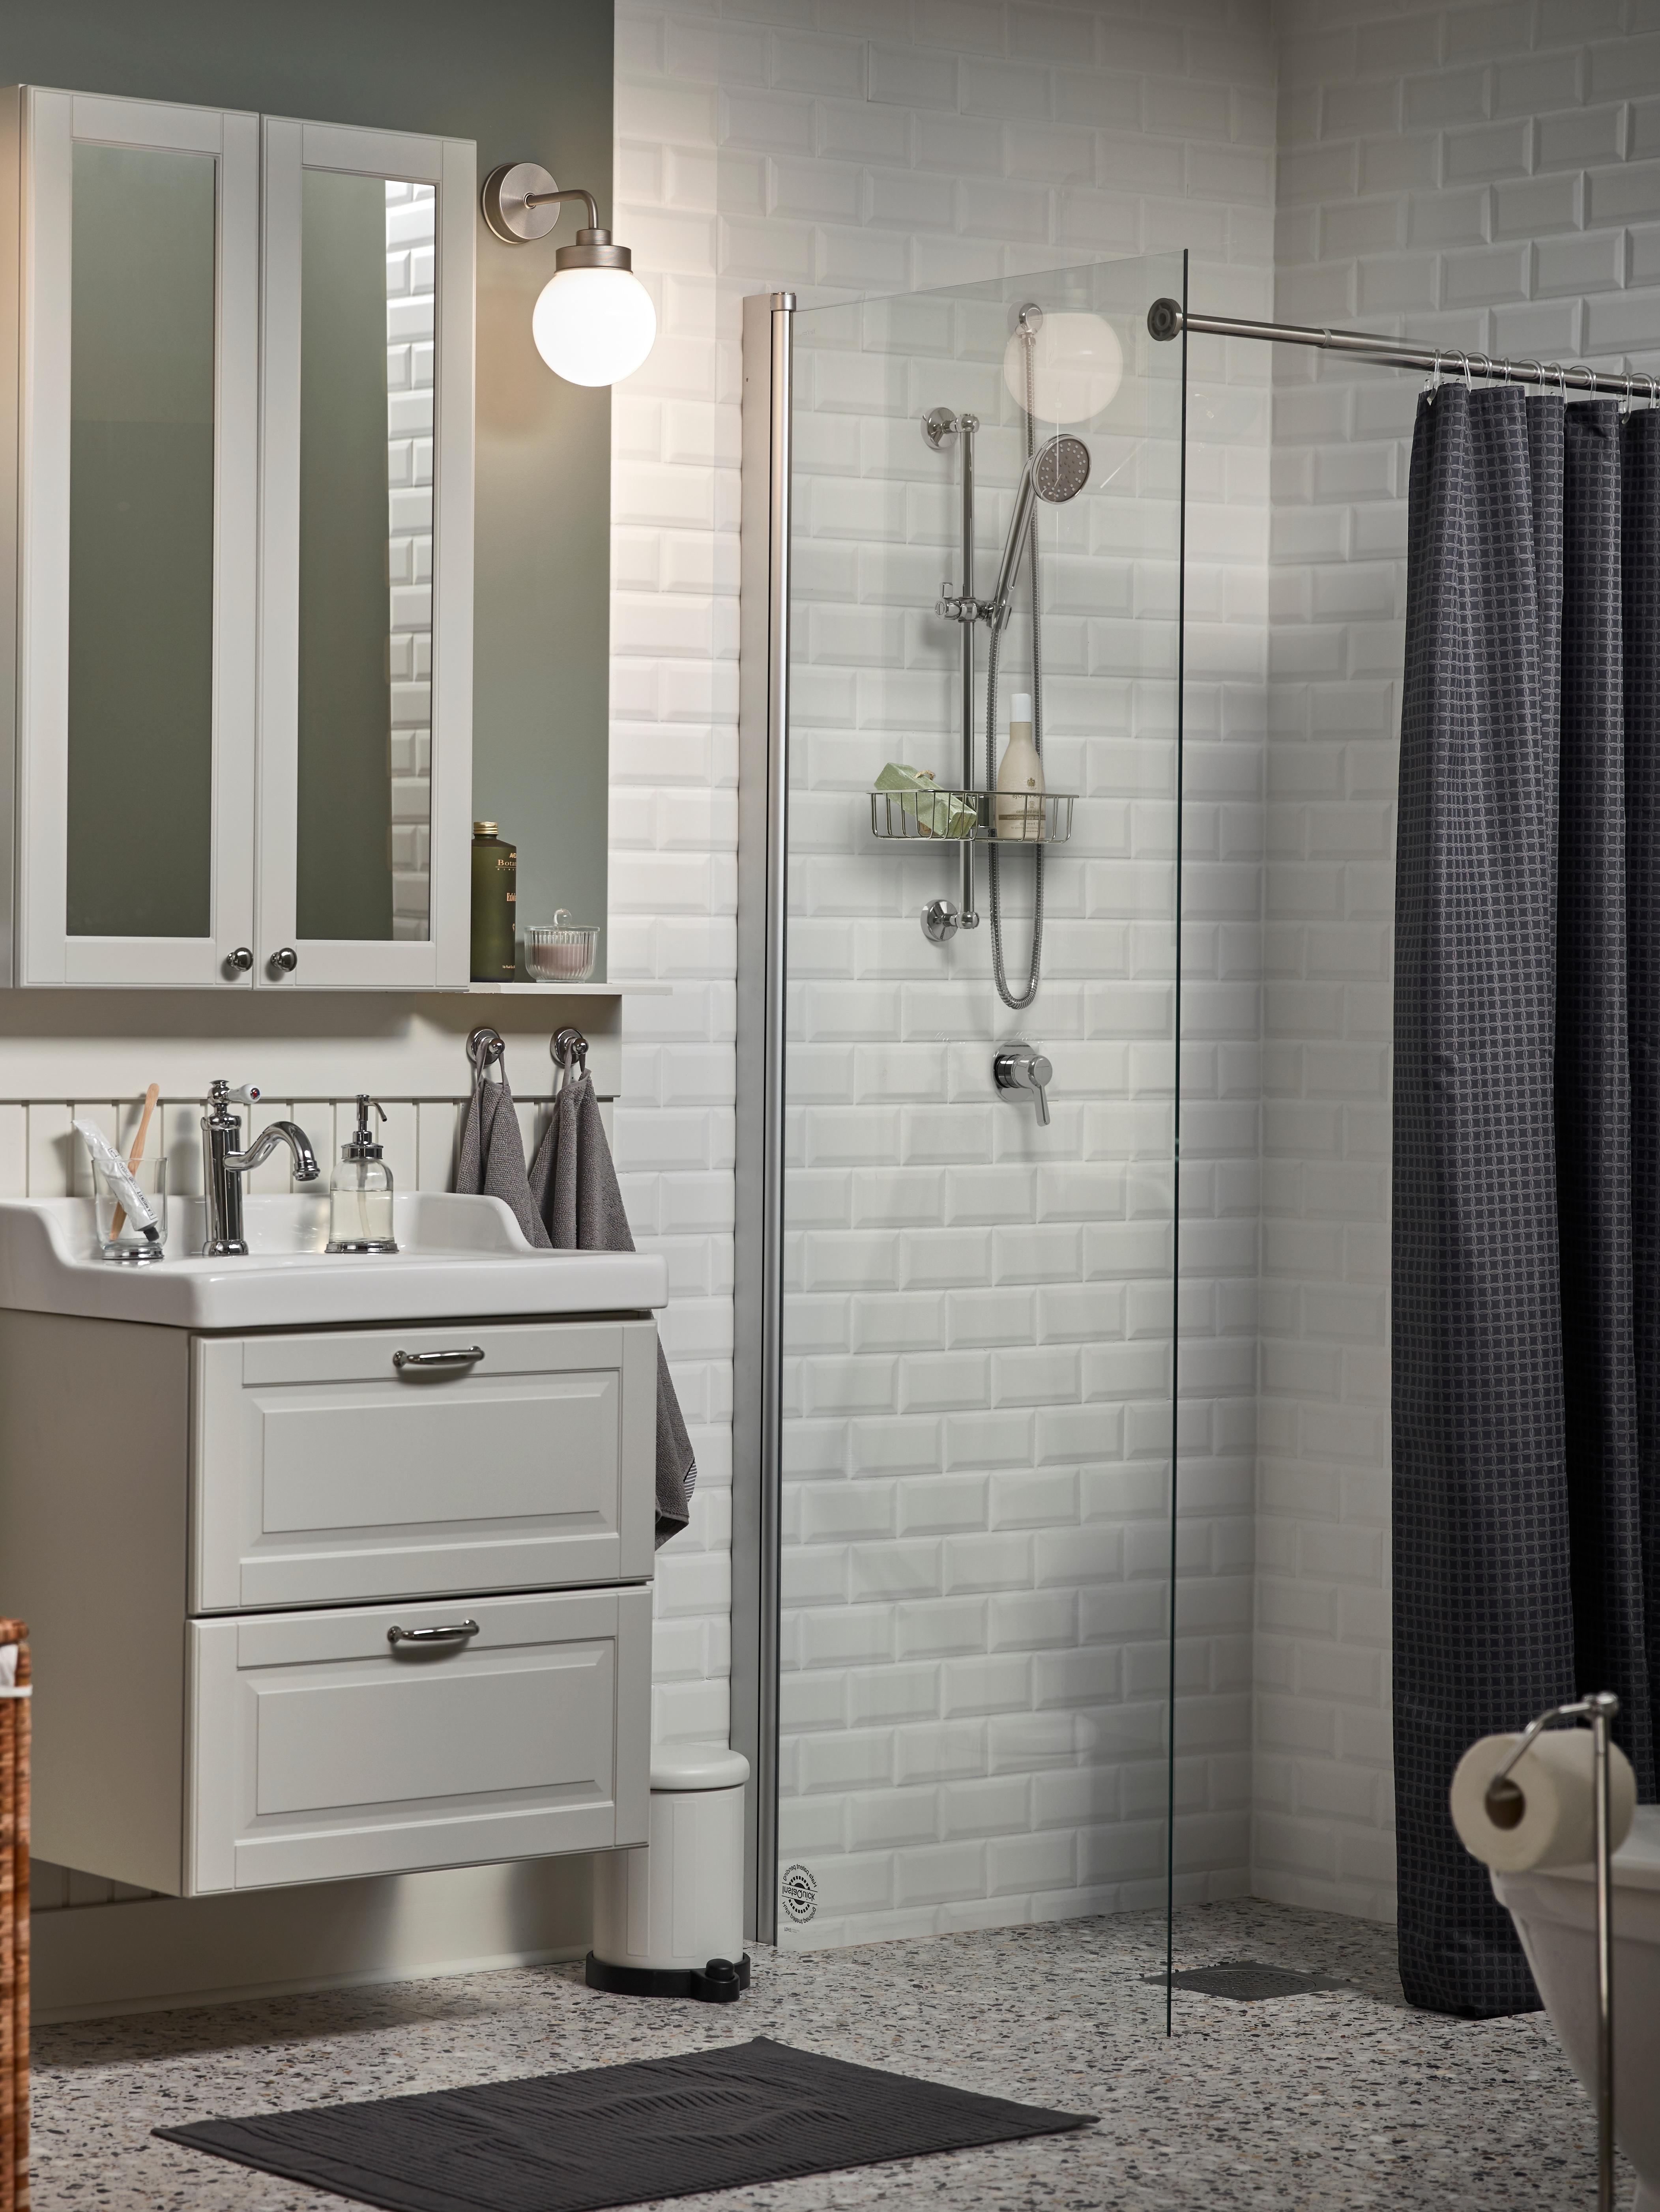 Bathroom with mirror cabinet, wash-stand, bath rug, shower mixer, shower curtain, wall lamp, waste bin, soap dispenser.